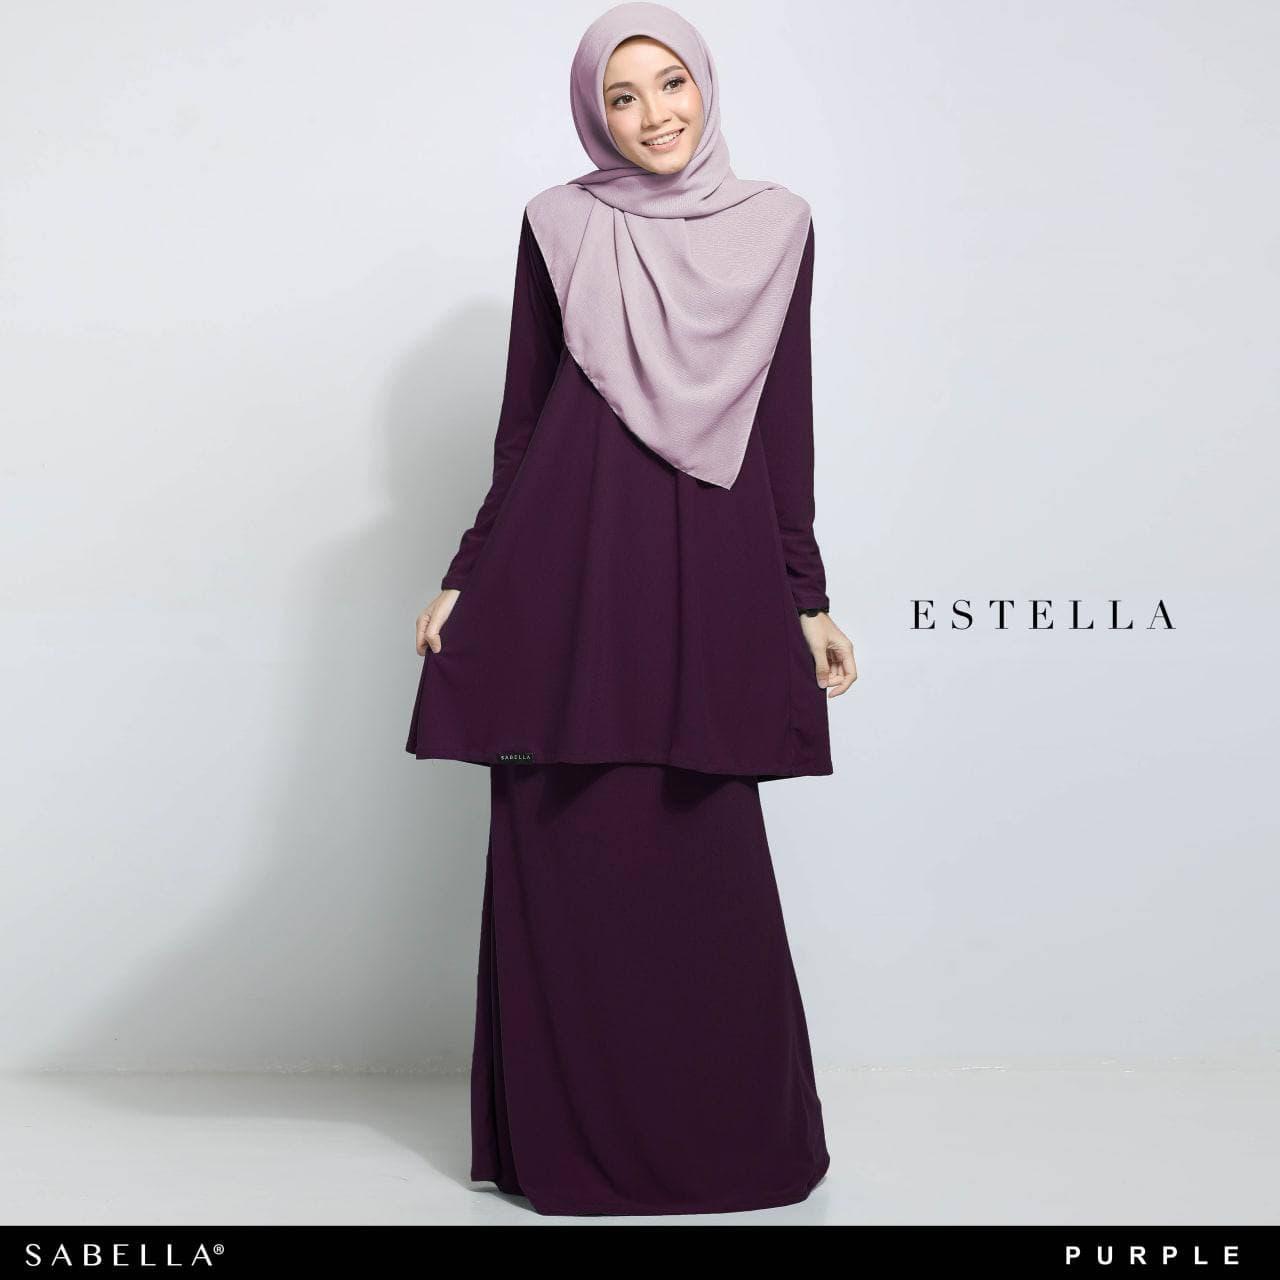 Estella 2.0 Purple (R)